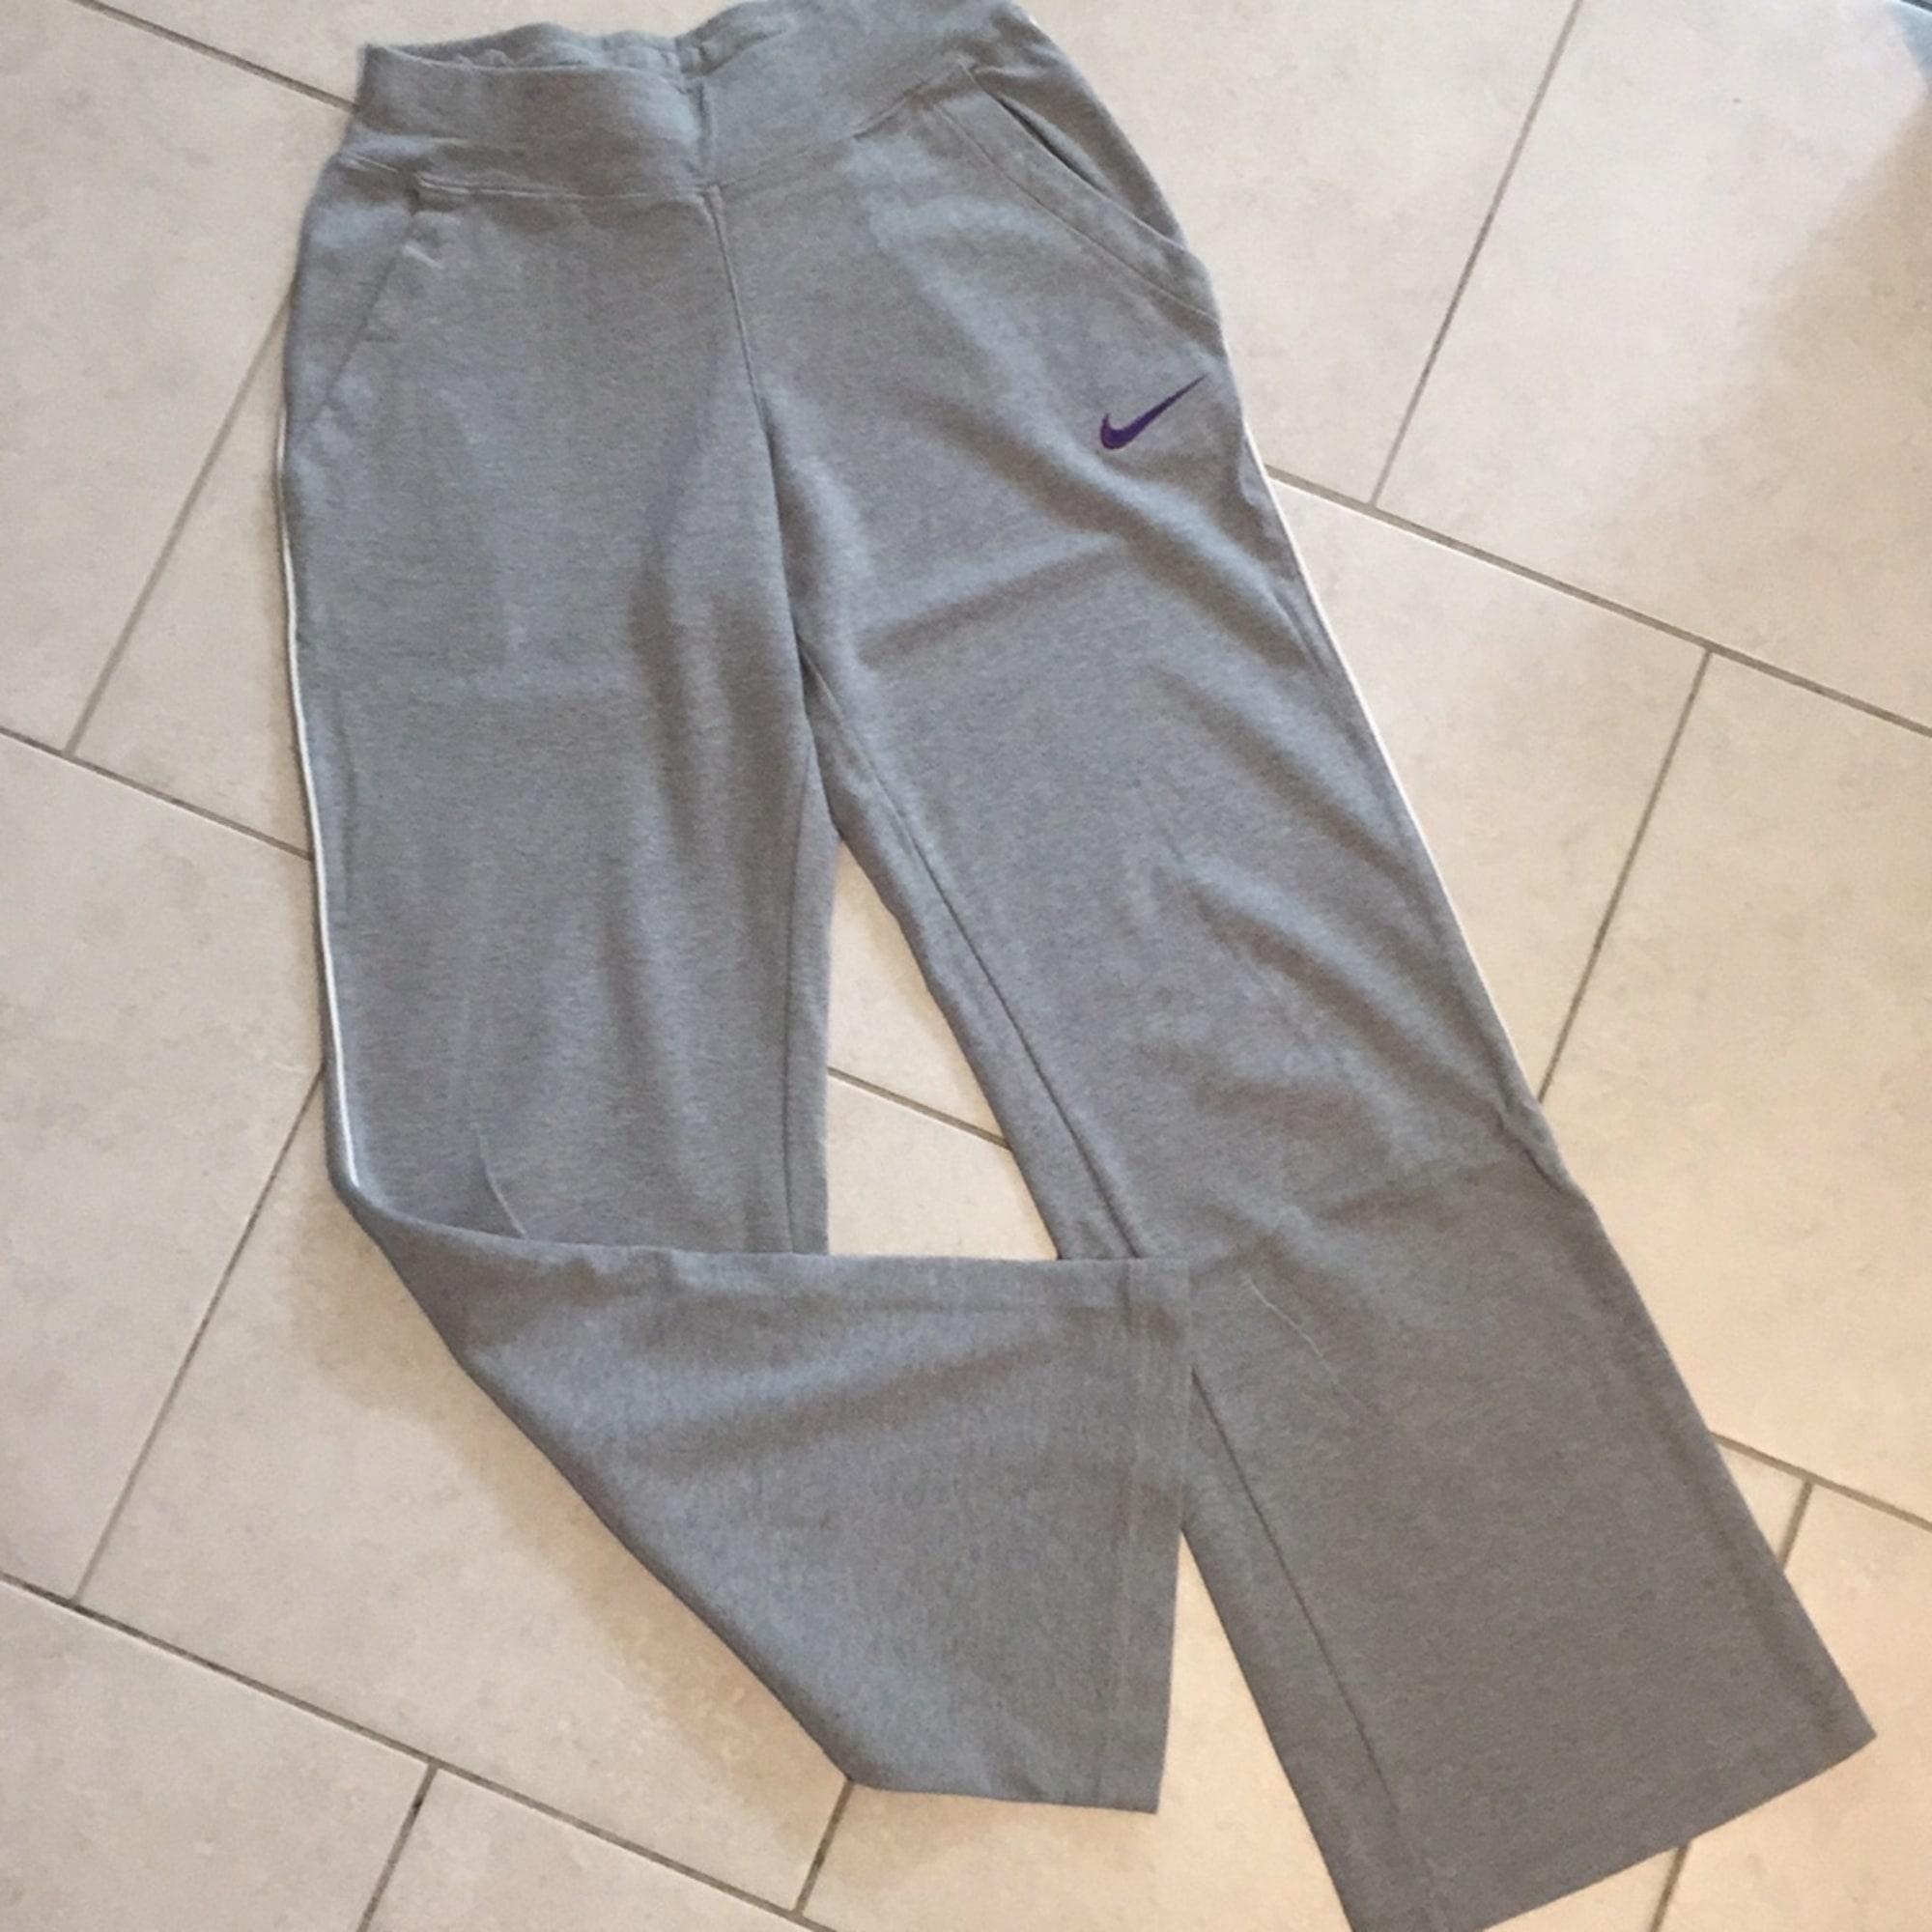 Pantalon Ans 14 De Survêtement Nike 13 5391618 Gris ARL5j4